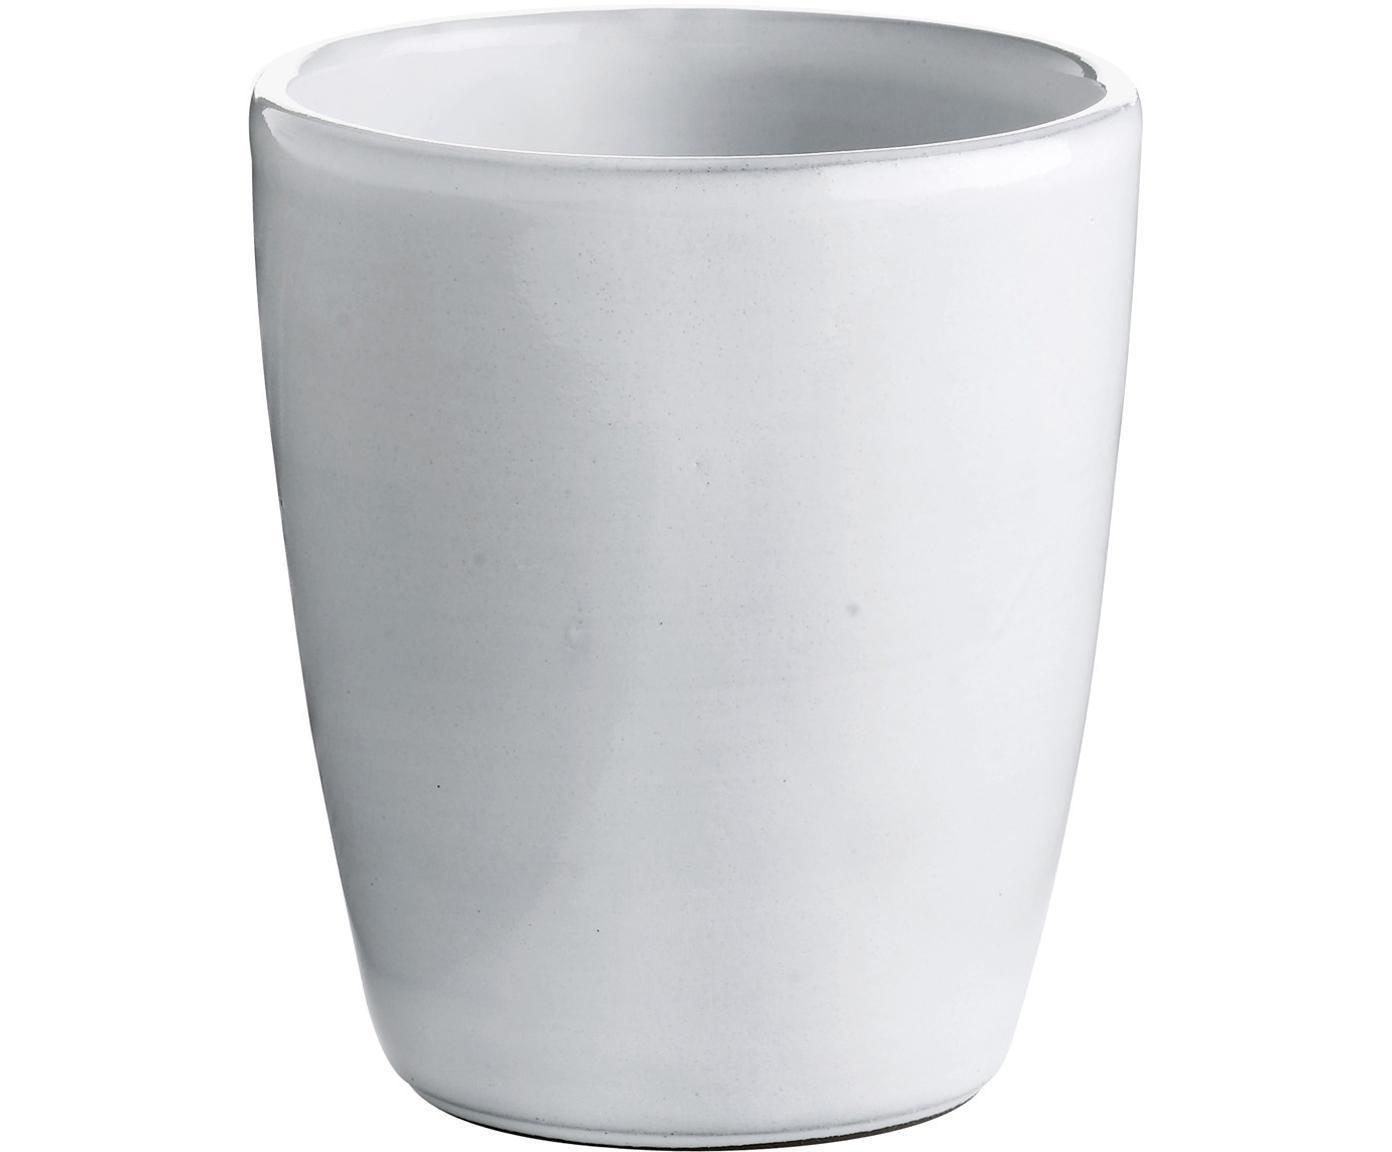 Keramik-Becher Haze in Weiß, 2 Stück, Keramik, glasiert, Weiß, Grau, Ø 10 x H 11 cm